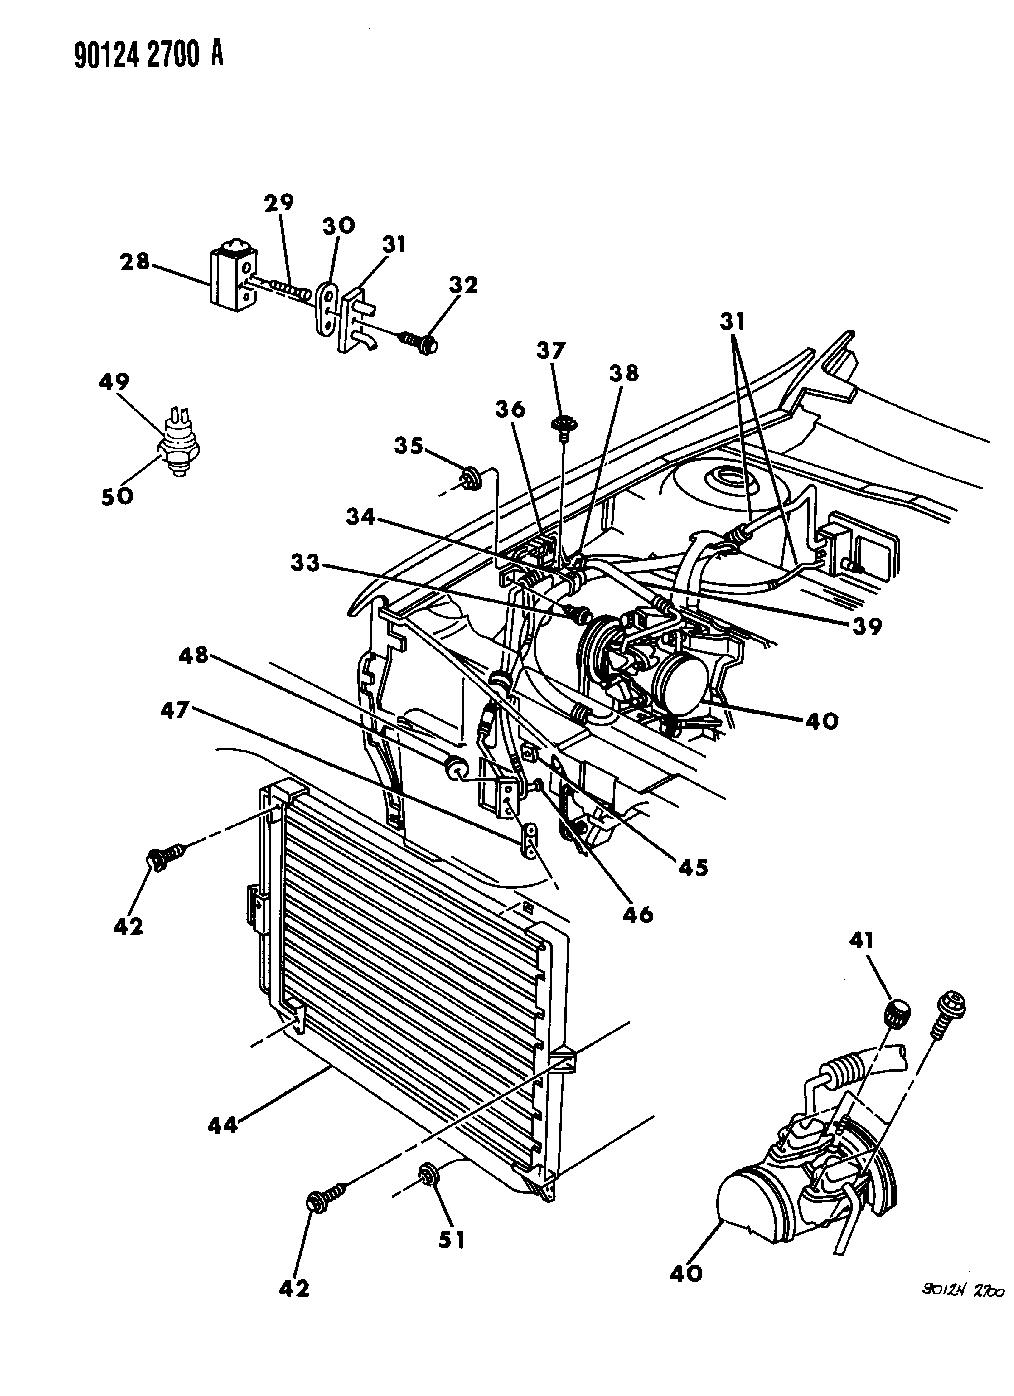 1990 dodge spirit heater wiring diagram wiring library Electric Water Heater Thermostat Schematic 1990 dodge spirit heater wiring diagram